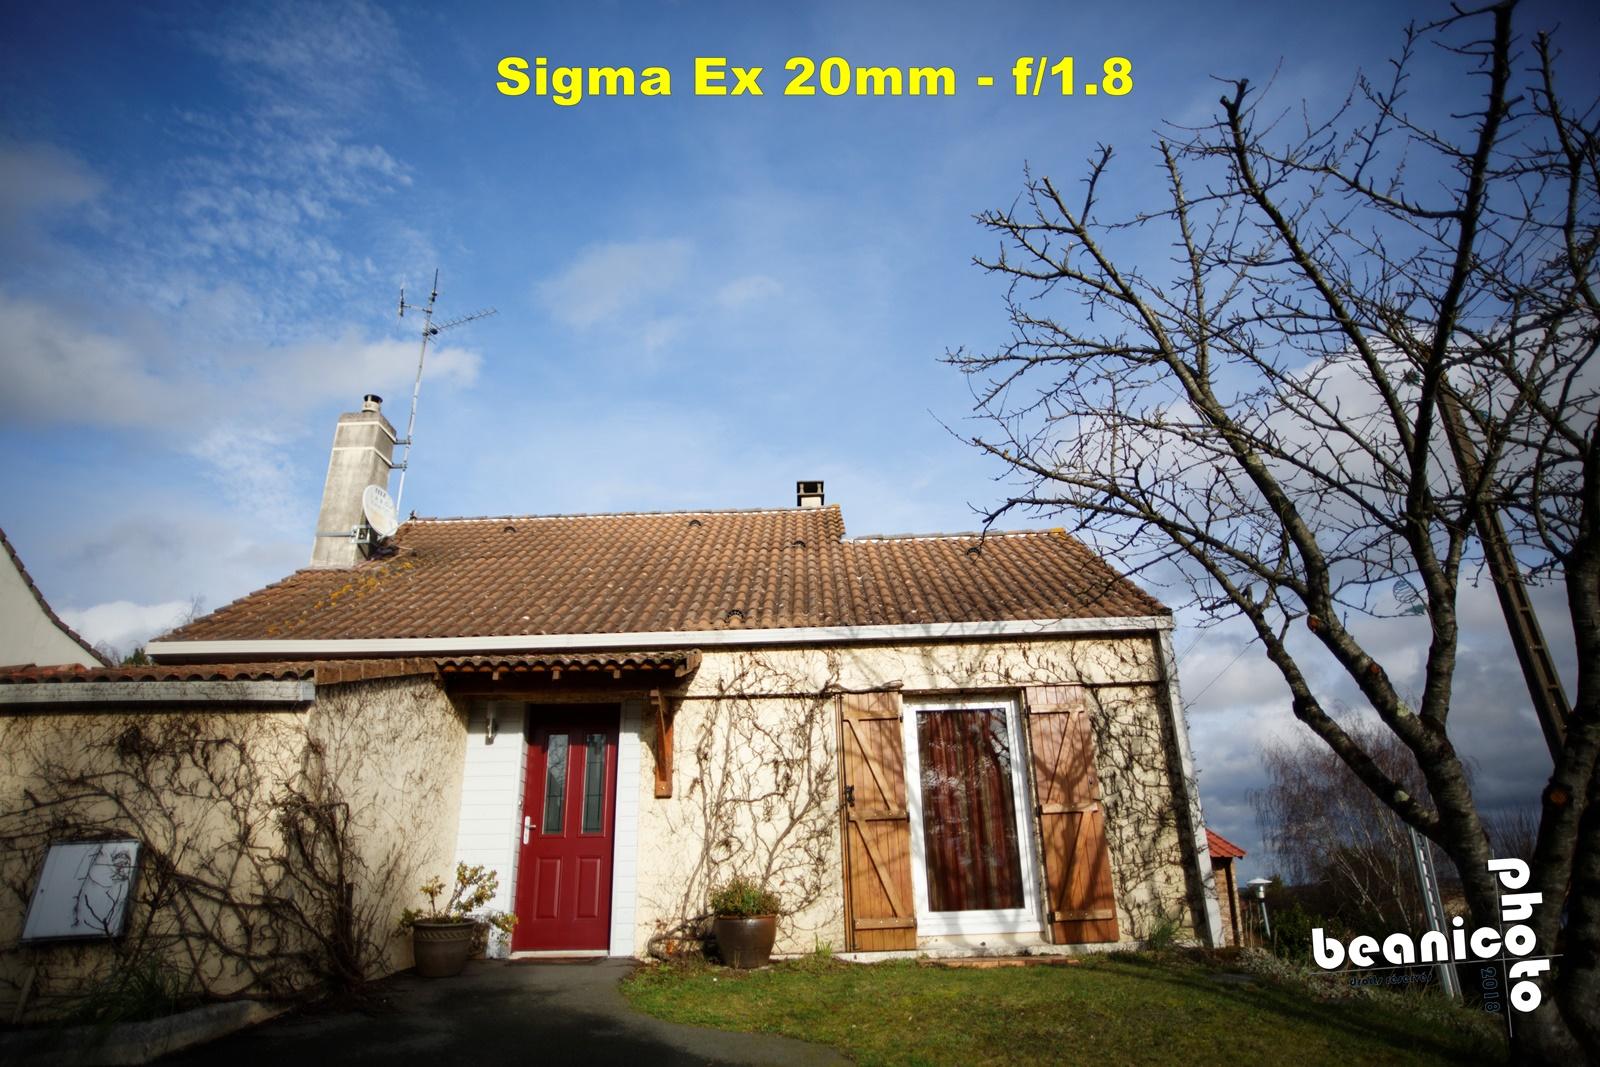 www.beanico-photo.fr - Canon 5DIII - Sigma Ex 20mm - f/1.8